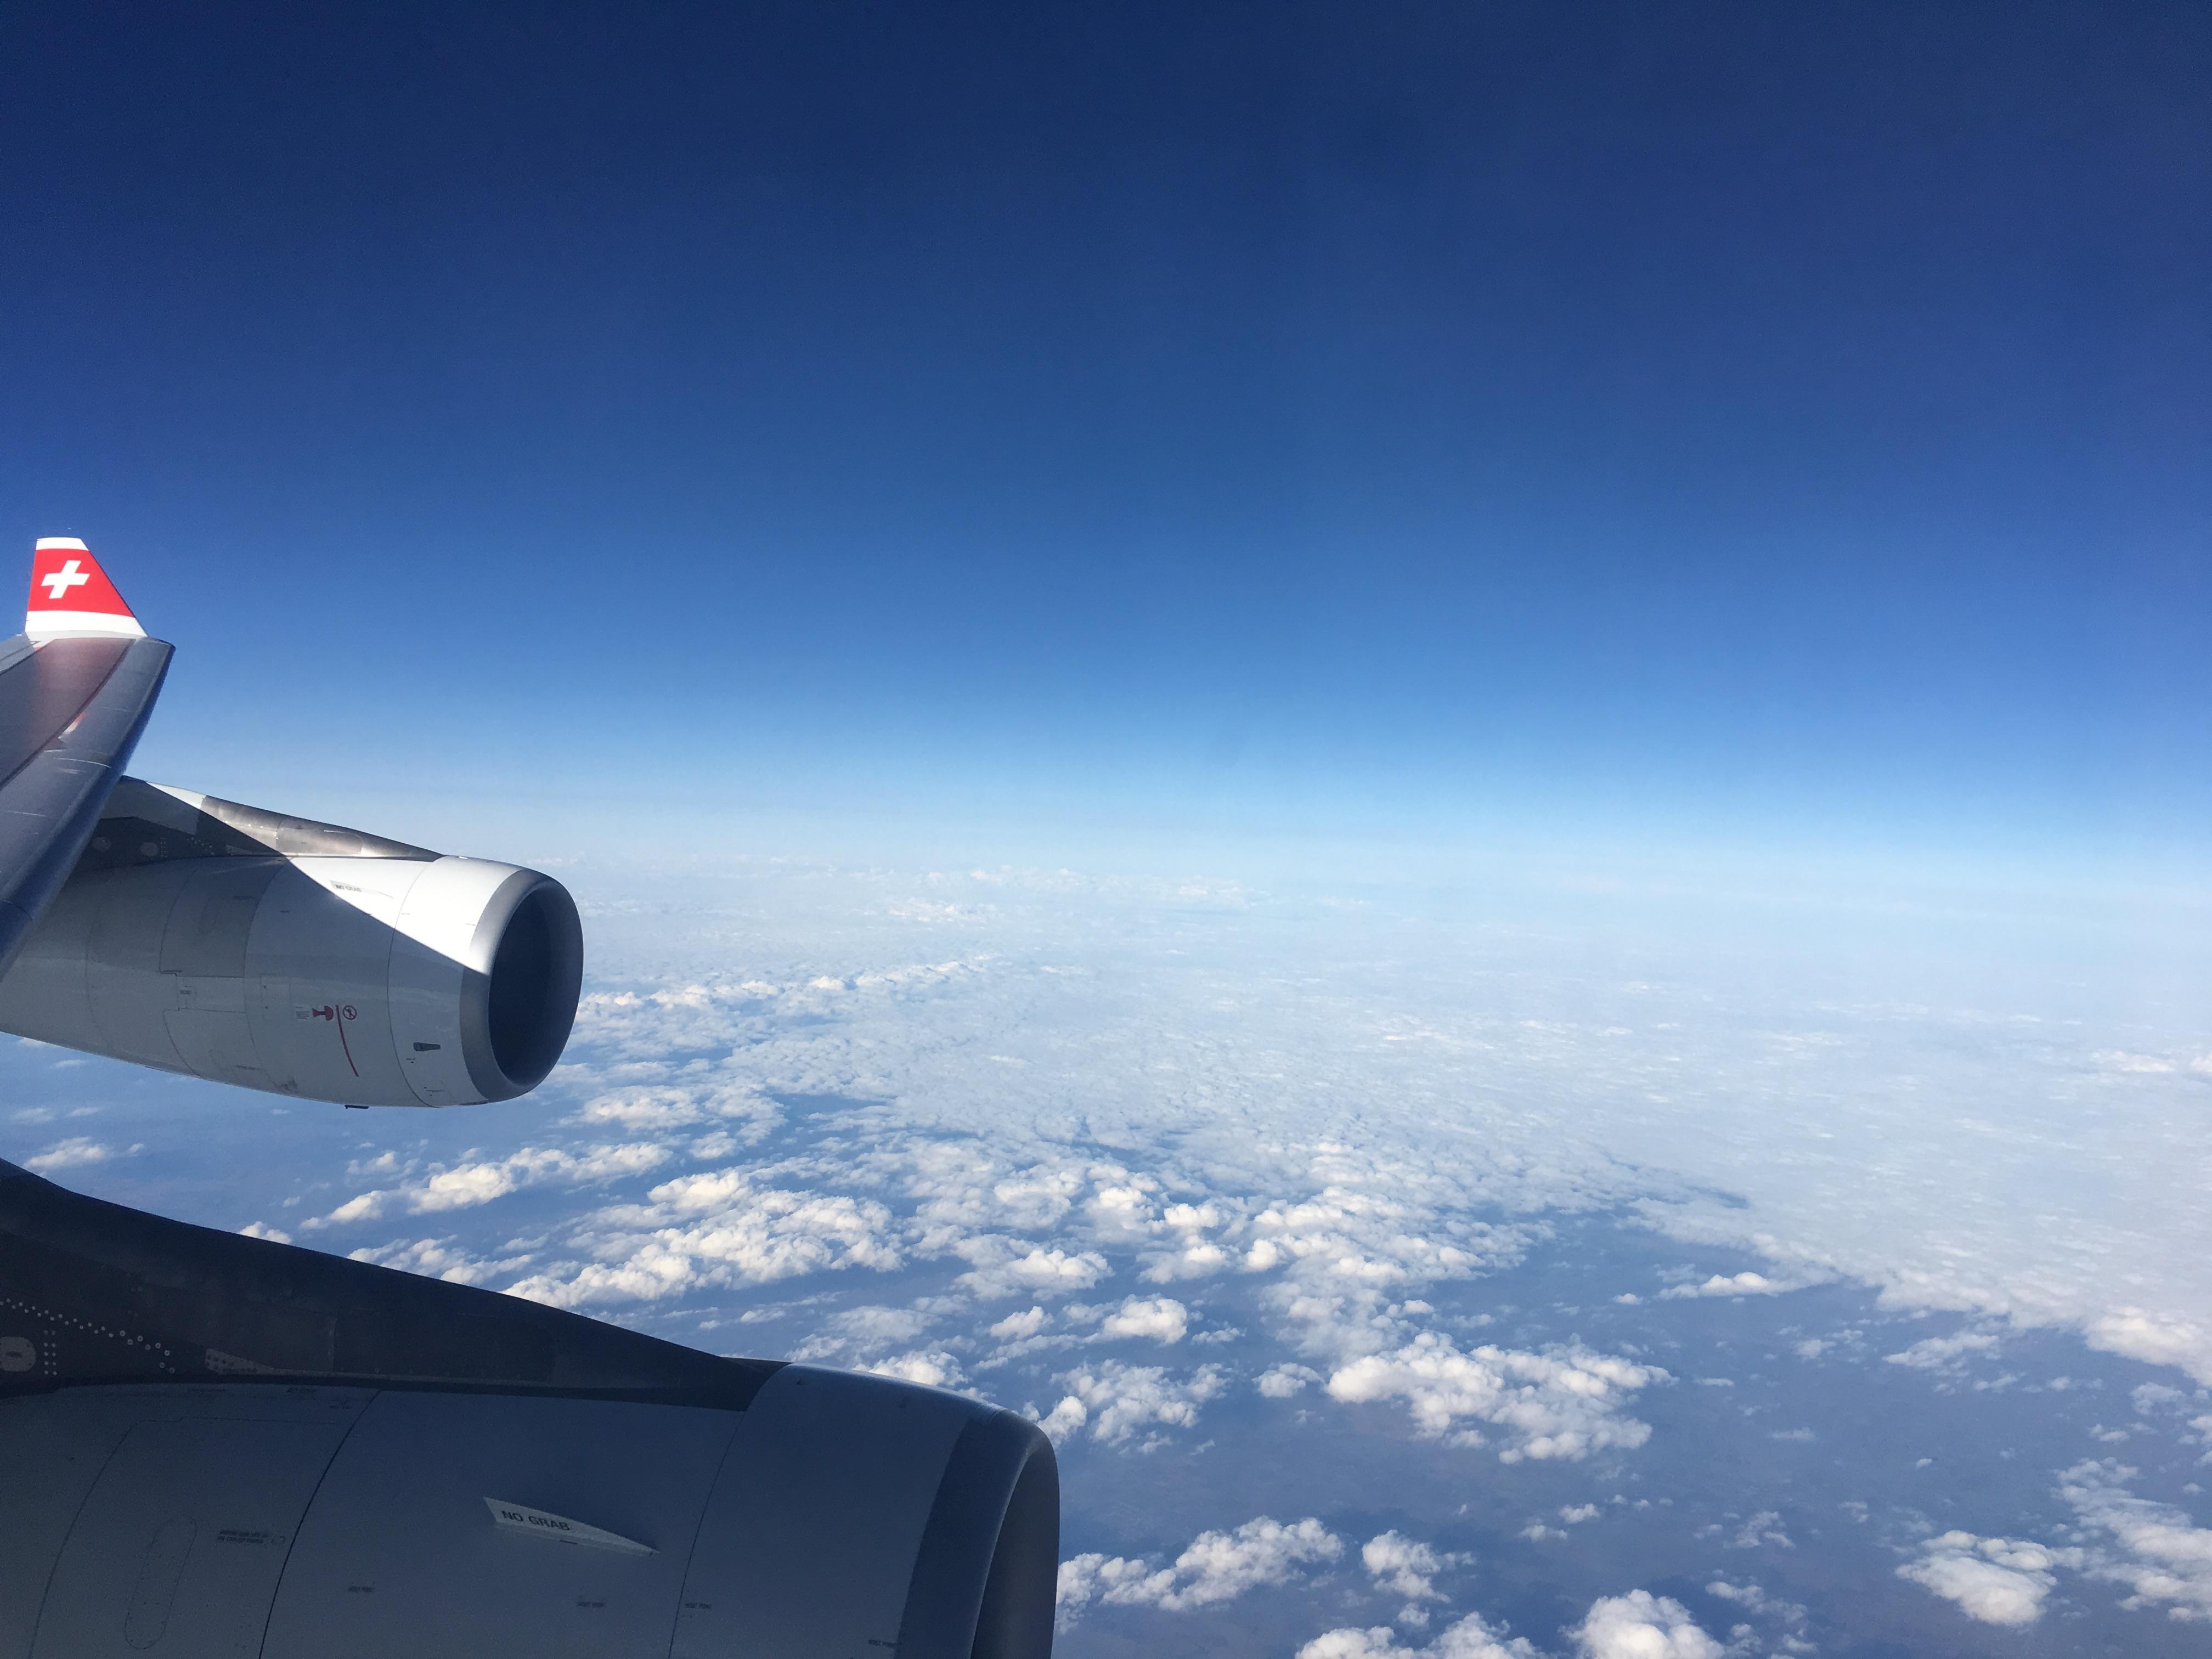 Business Class Review : スイスインターナショナルエアラインズ(LX) LX188  チューリッヒ(ZRH) – 上海浦東(PVG) エアバス A340 王様シート(Throne Seat)